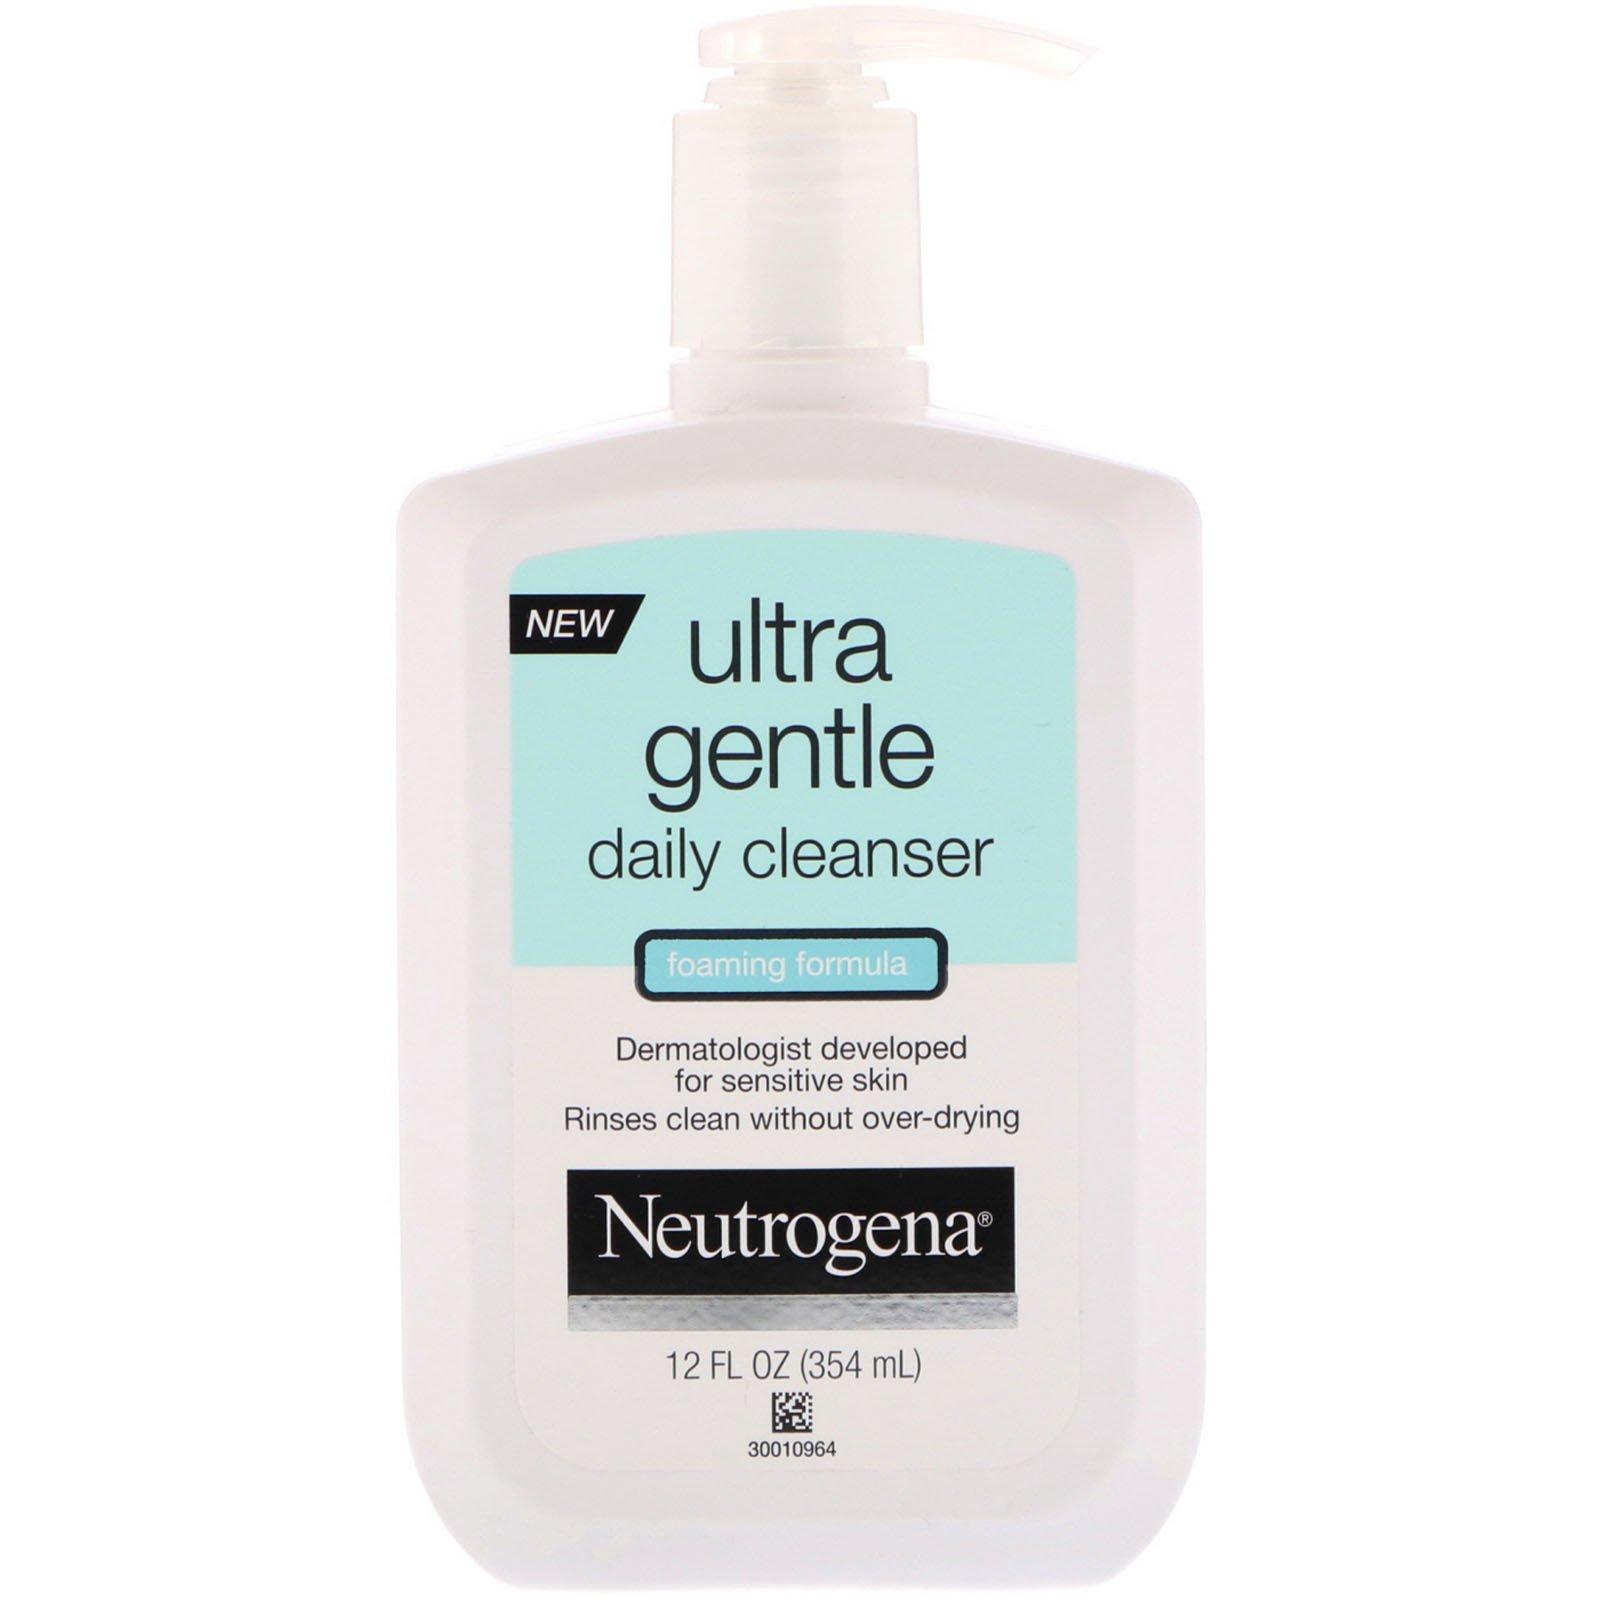 Sữa rửa mặt Neutrogena Ultra Gentle - Daily Cleanser (354ml)